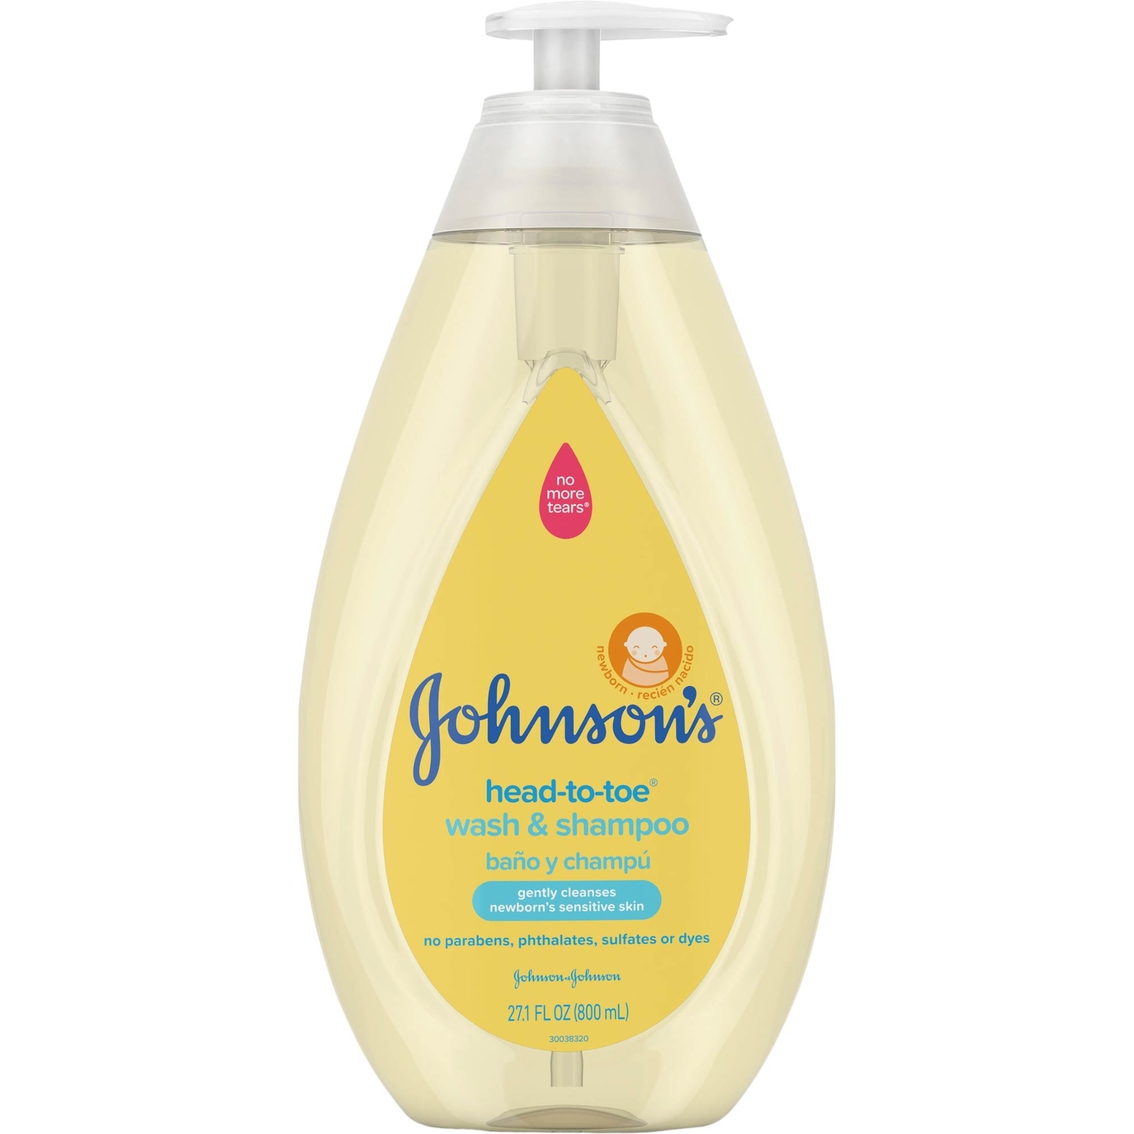 Johnson's Head-To-Toe Gentle Baby Wash & Shampoo